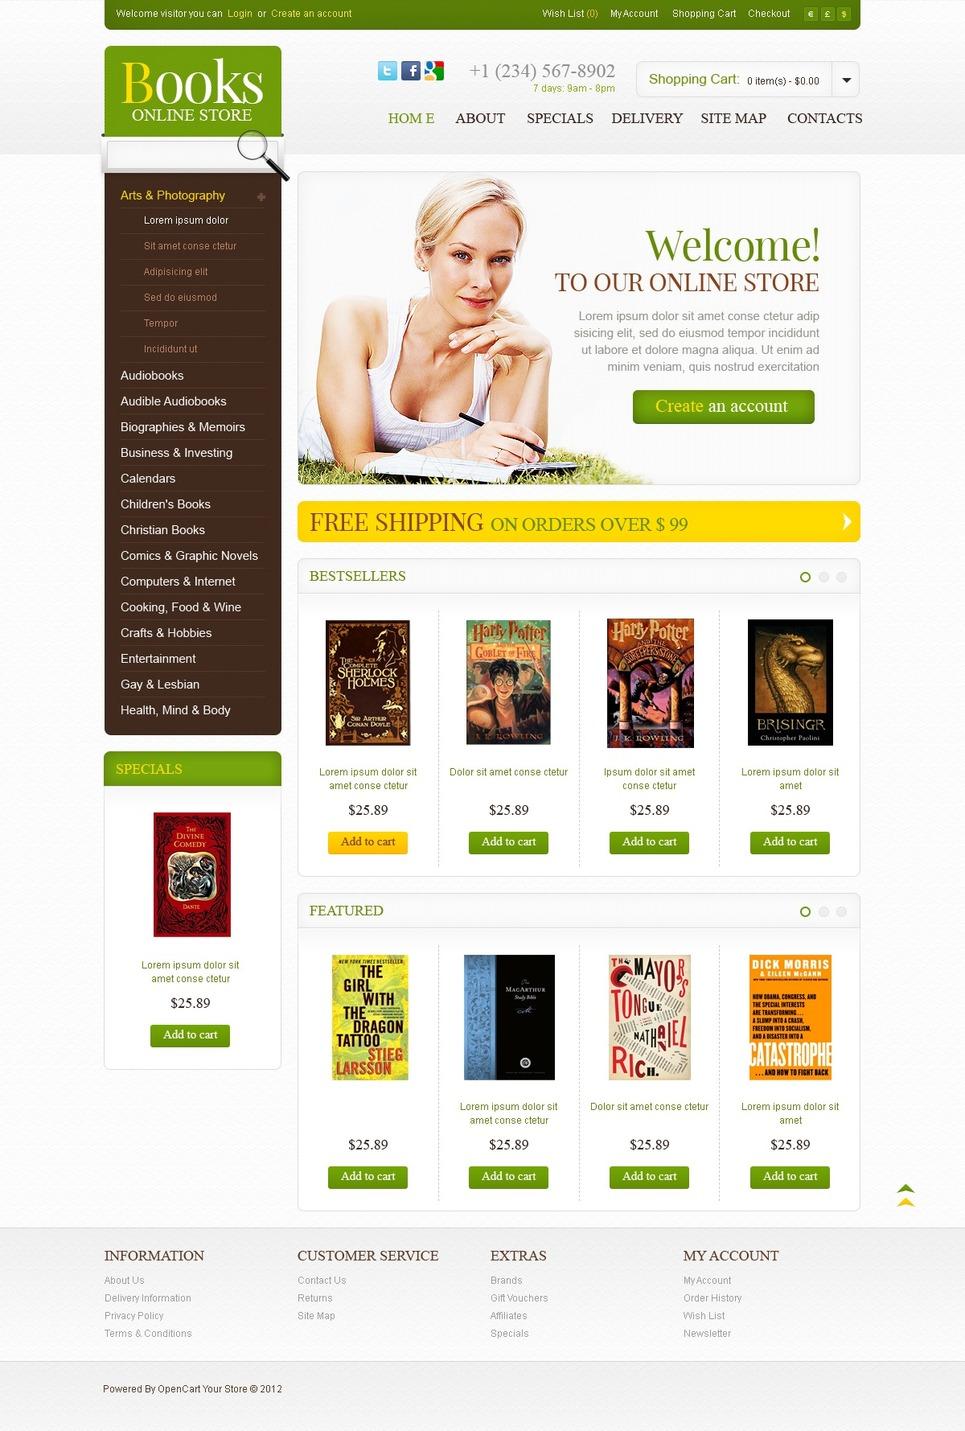 Bestsellers OpenCart Template New Screenshots BIG